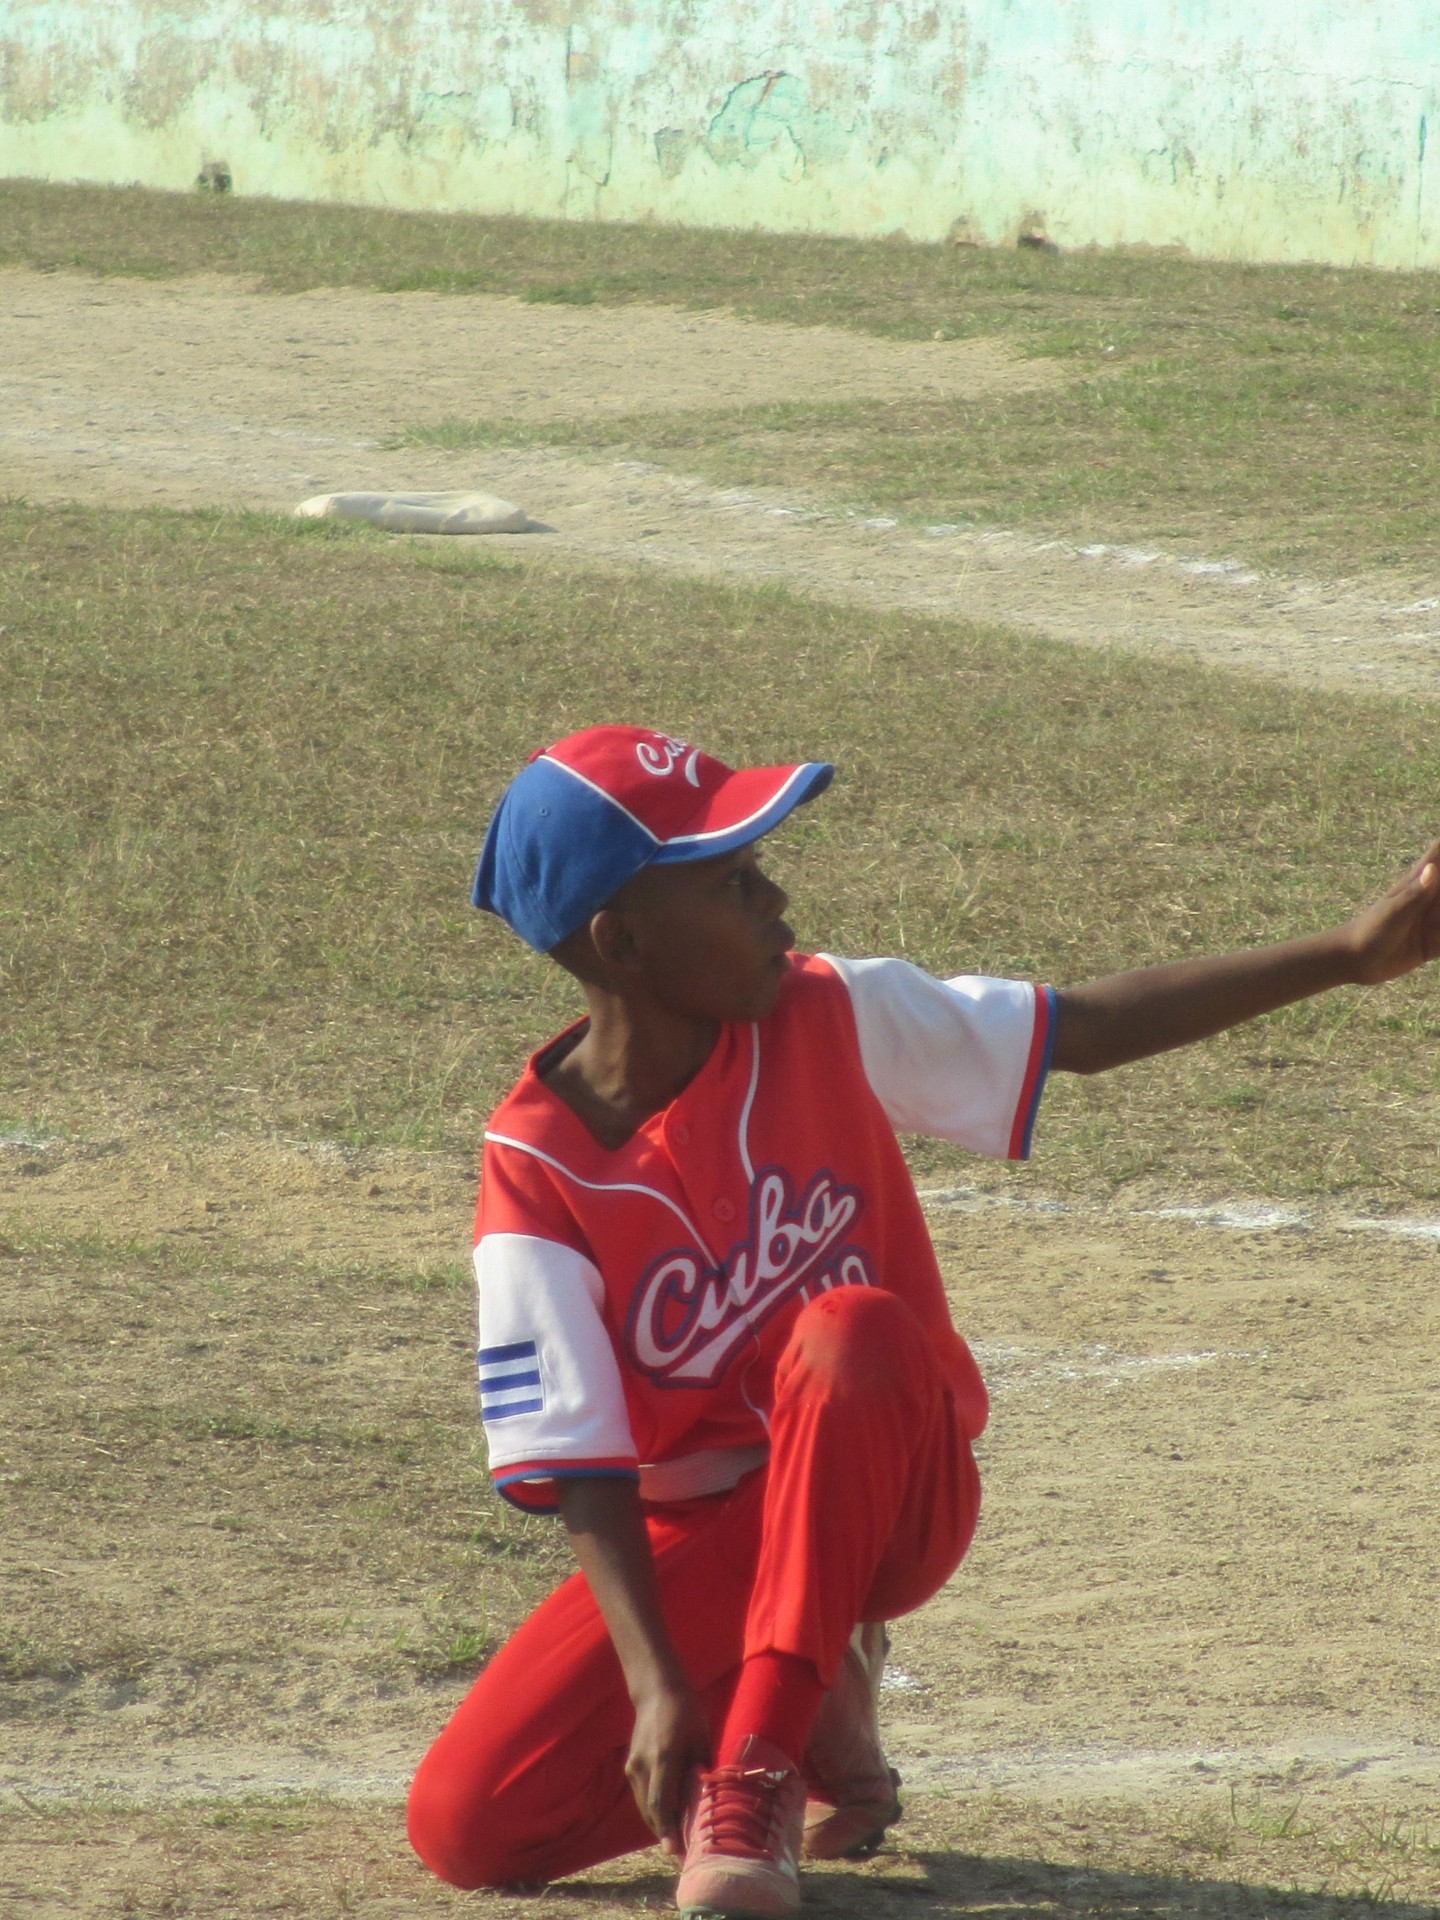 Cuba_player